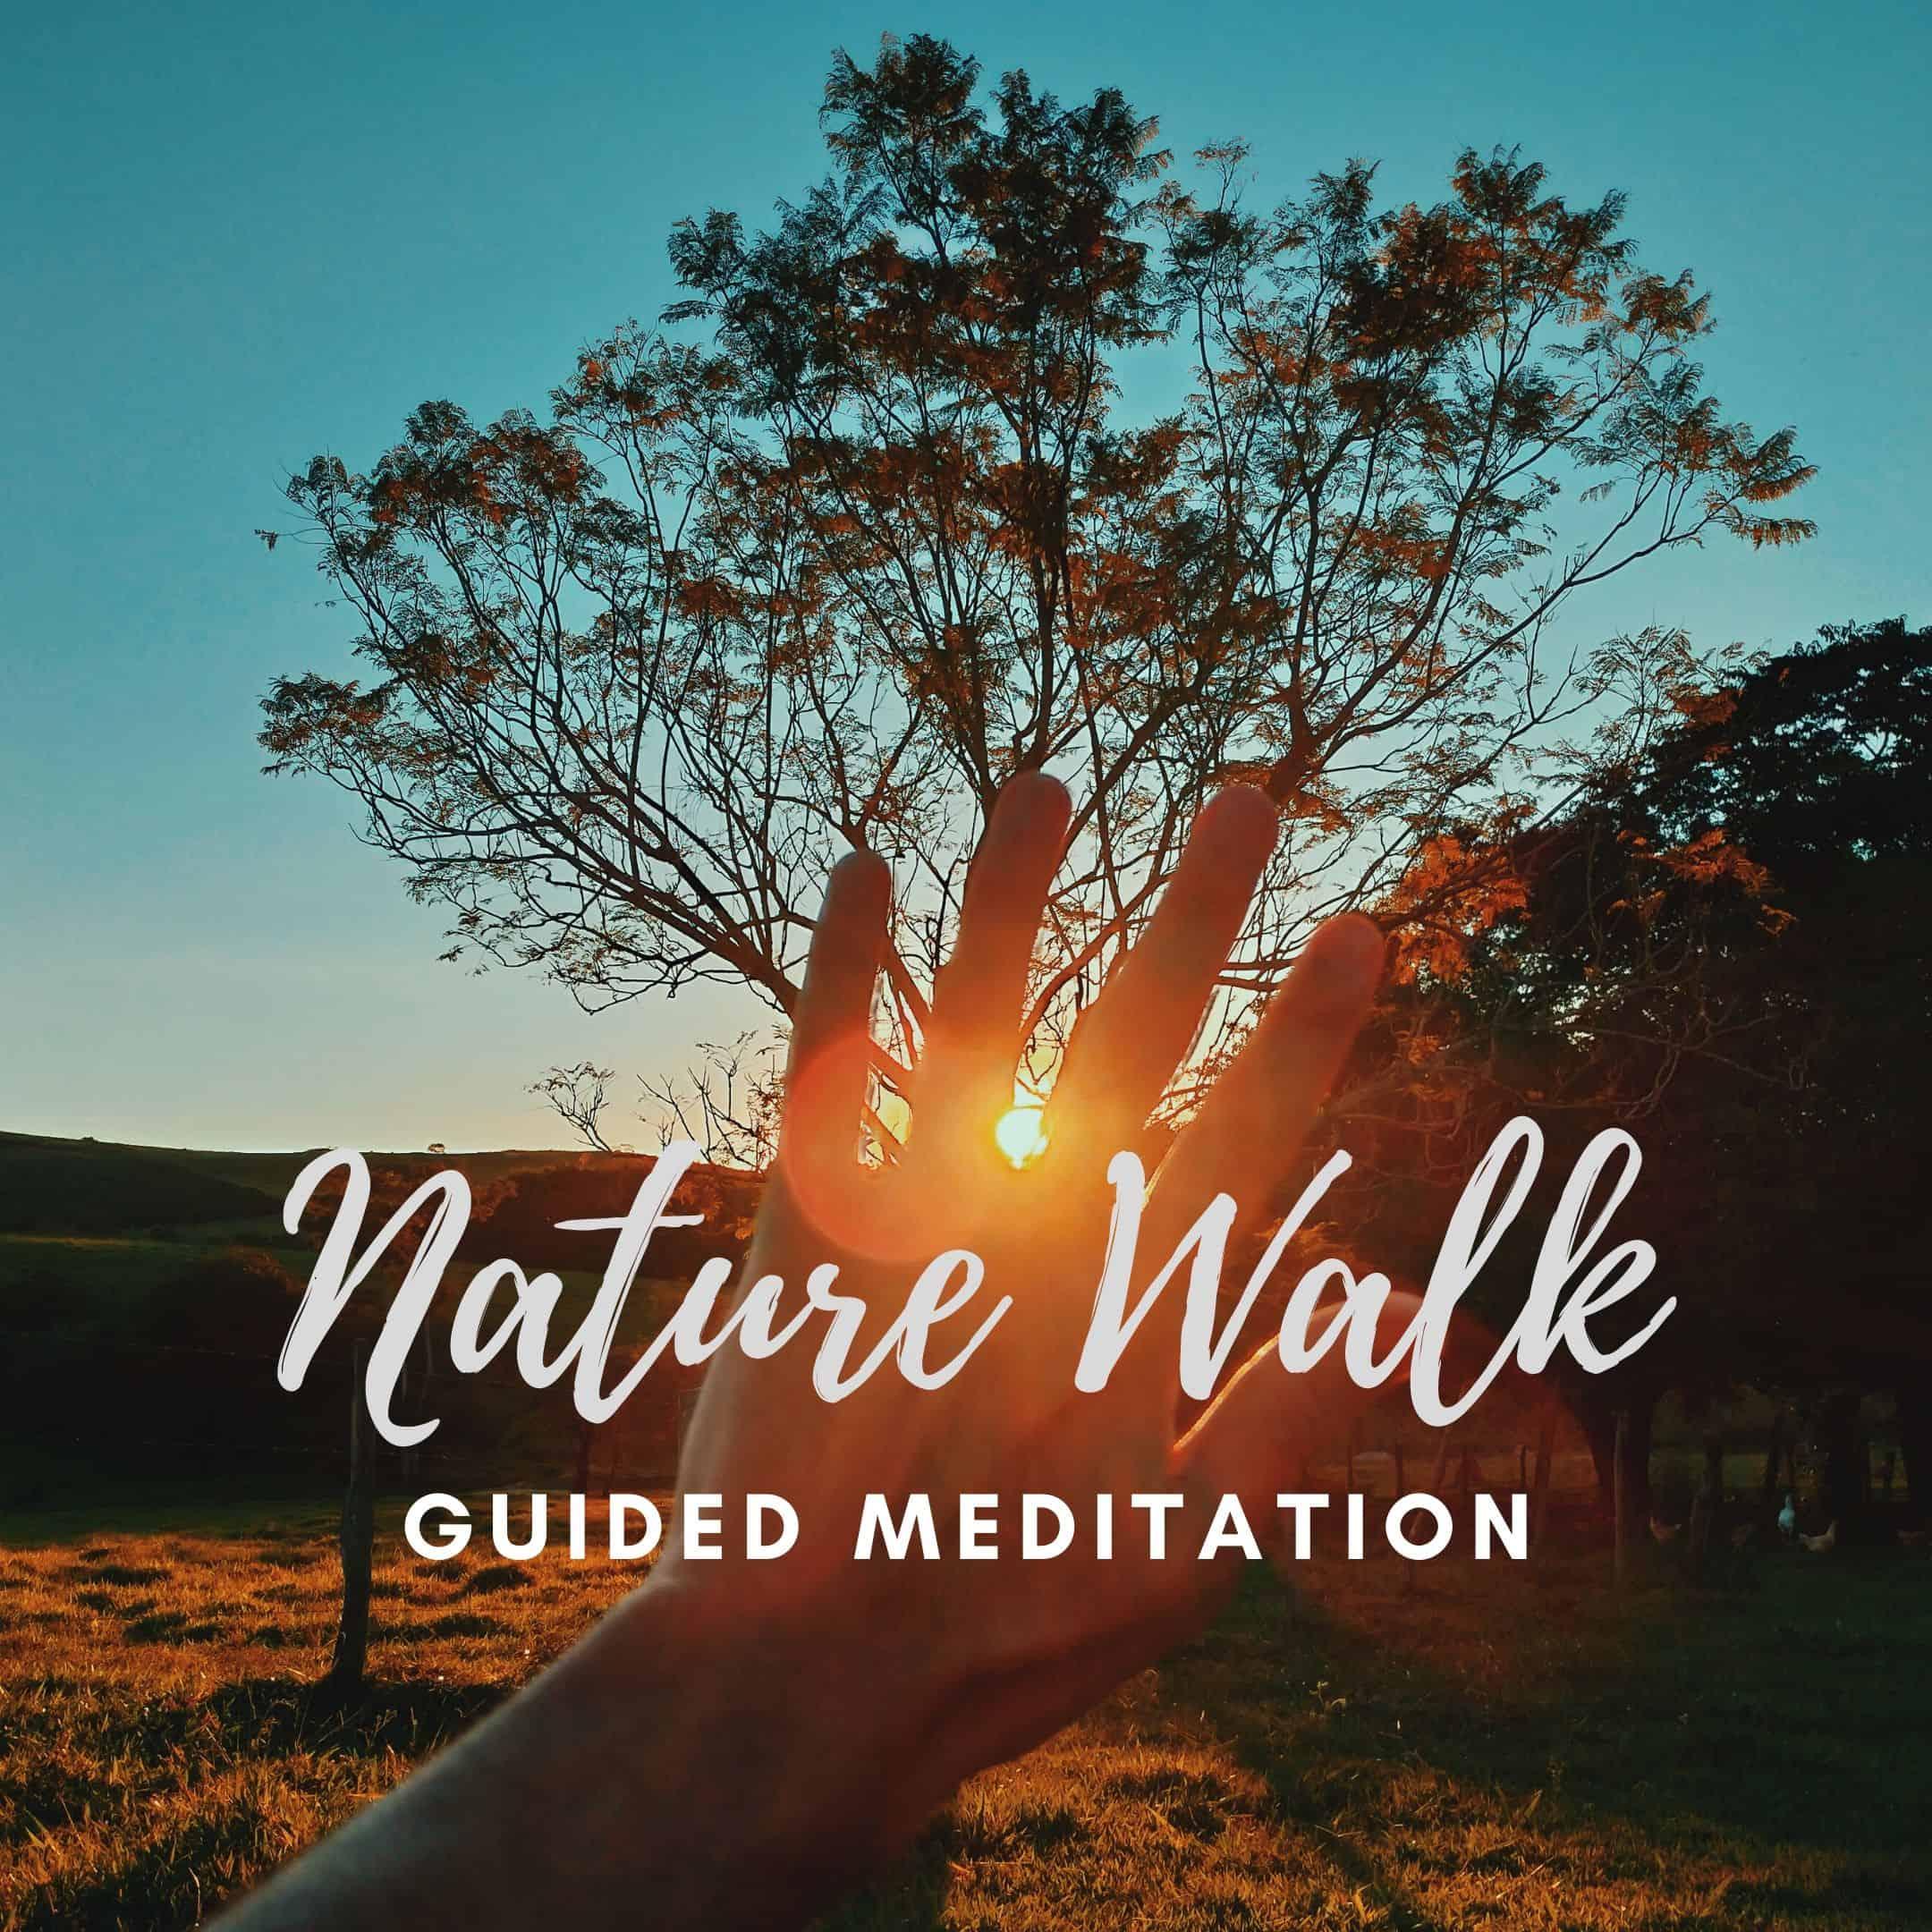 Nature walk meditation (1)